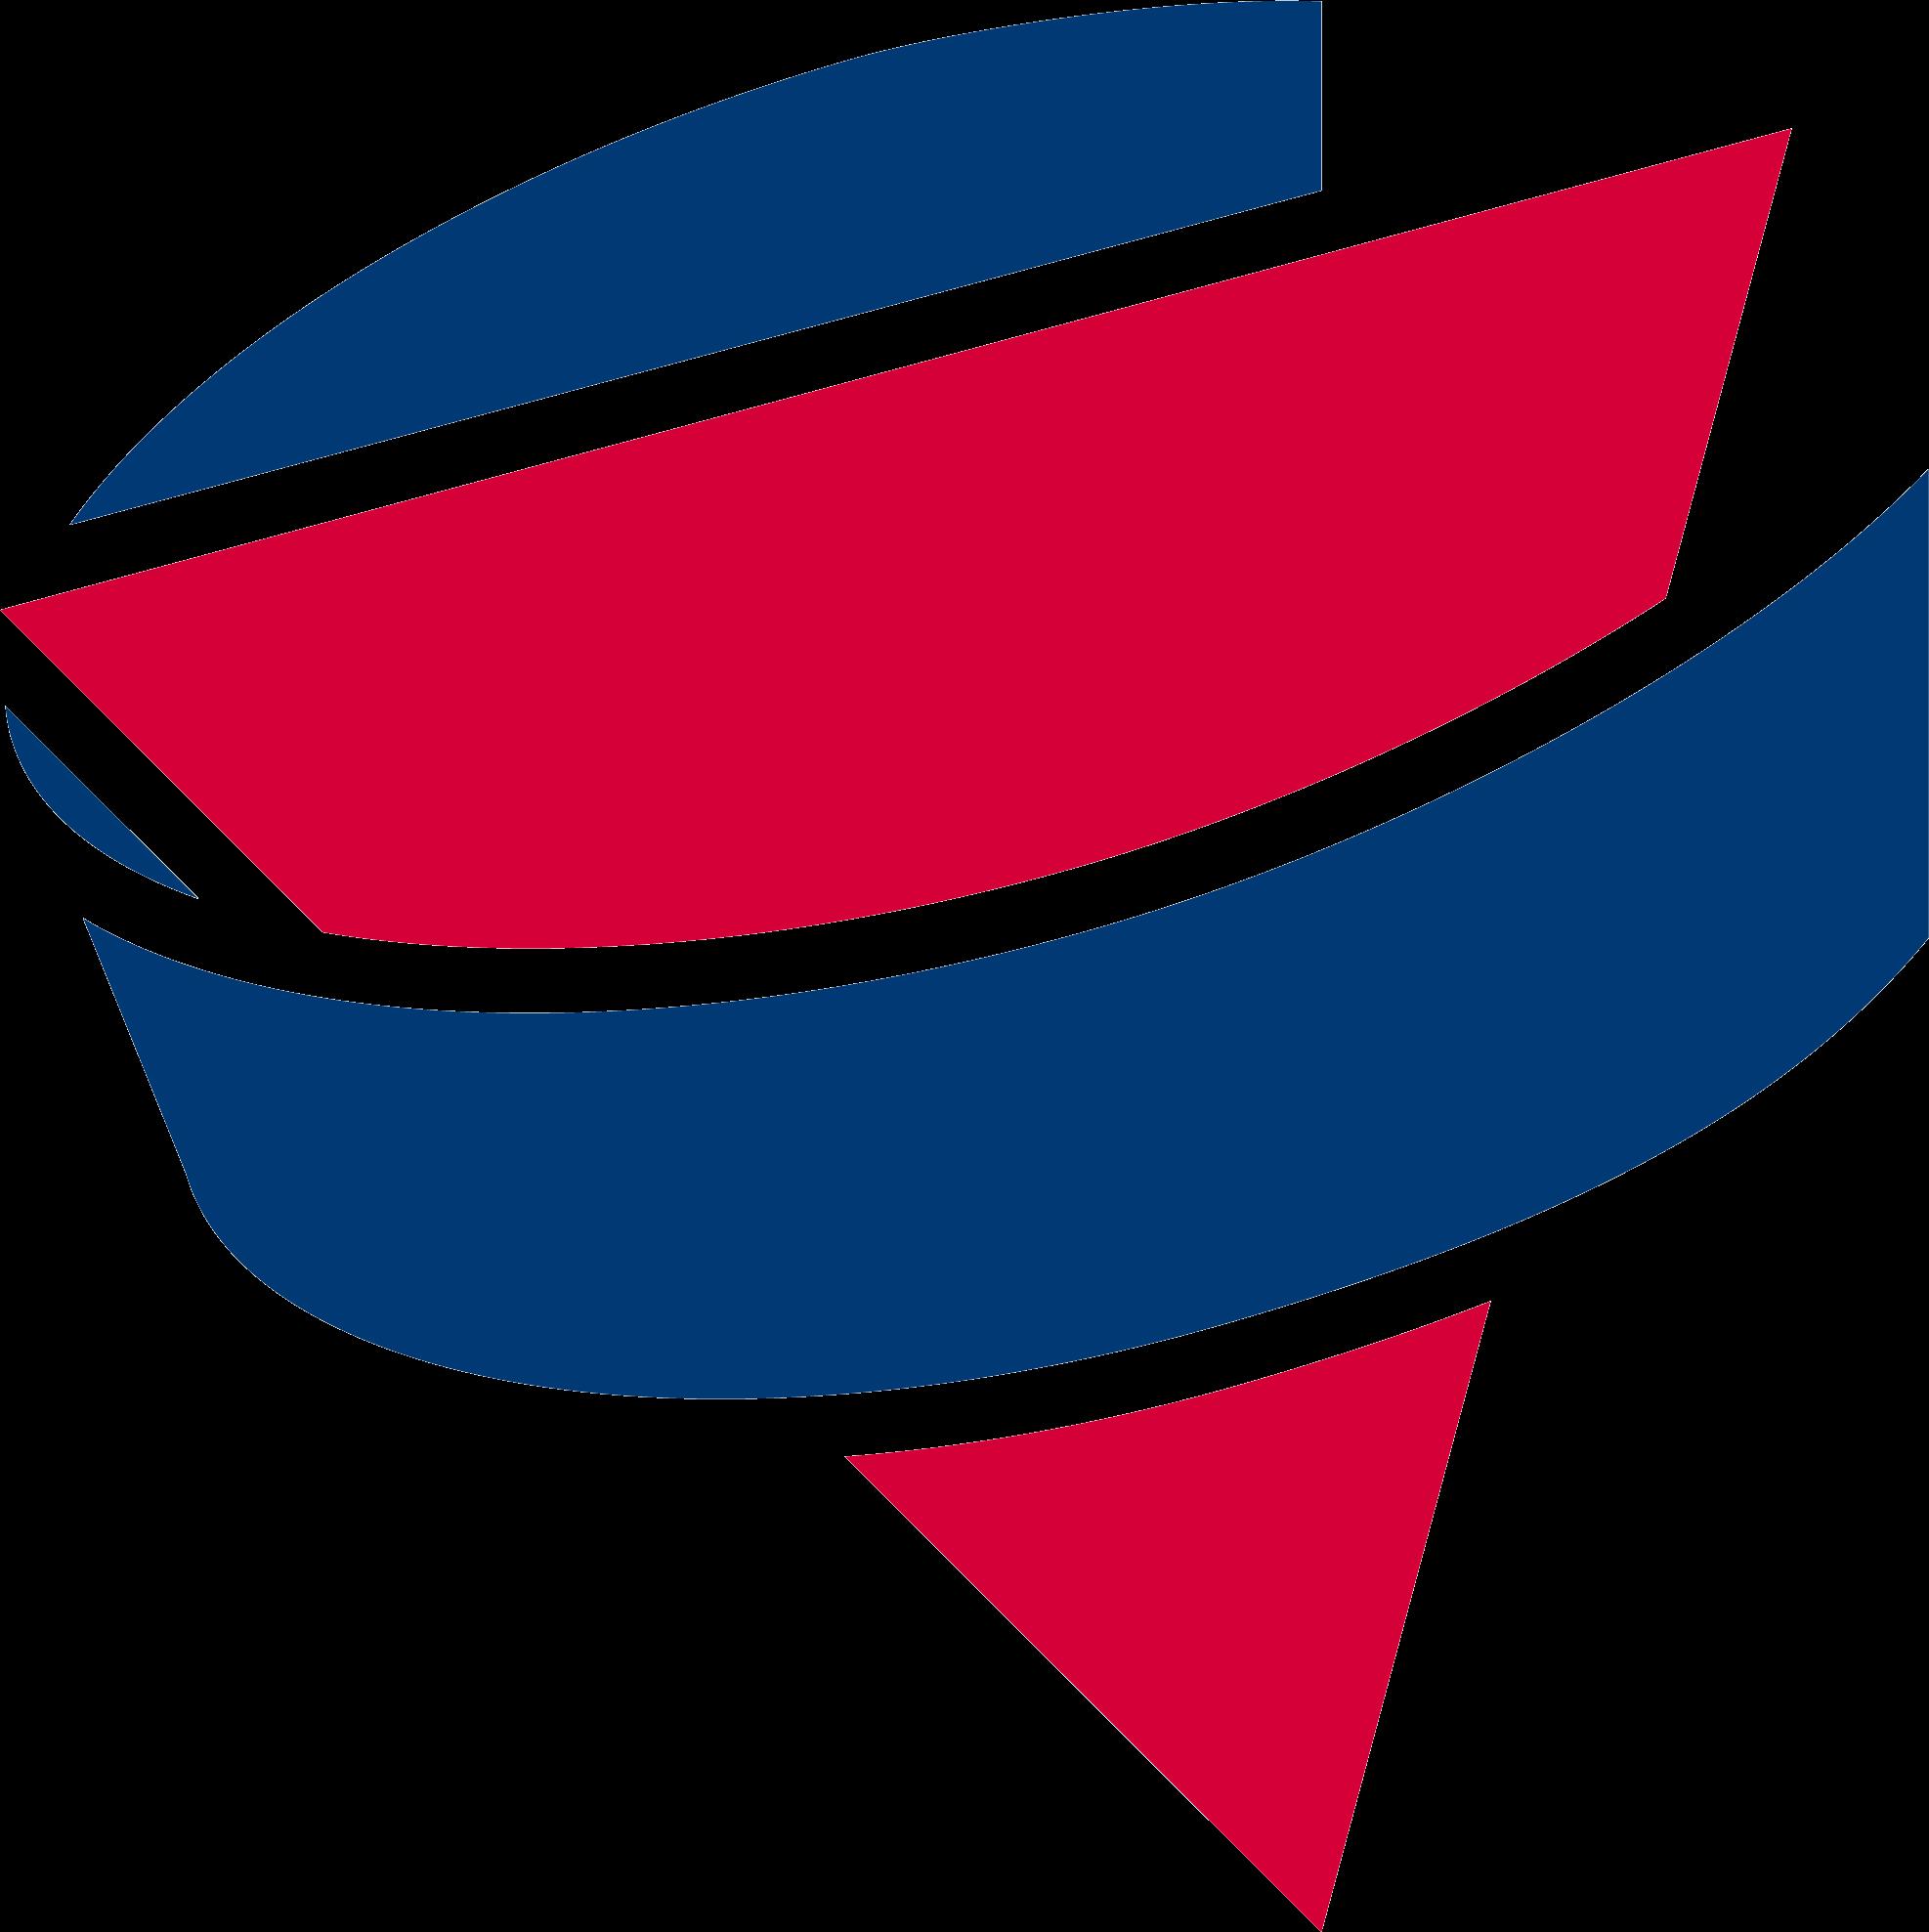 Cevi Region Bern